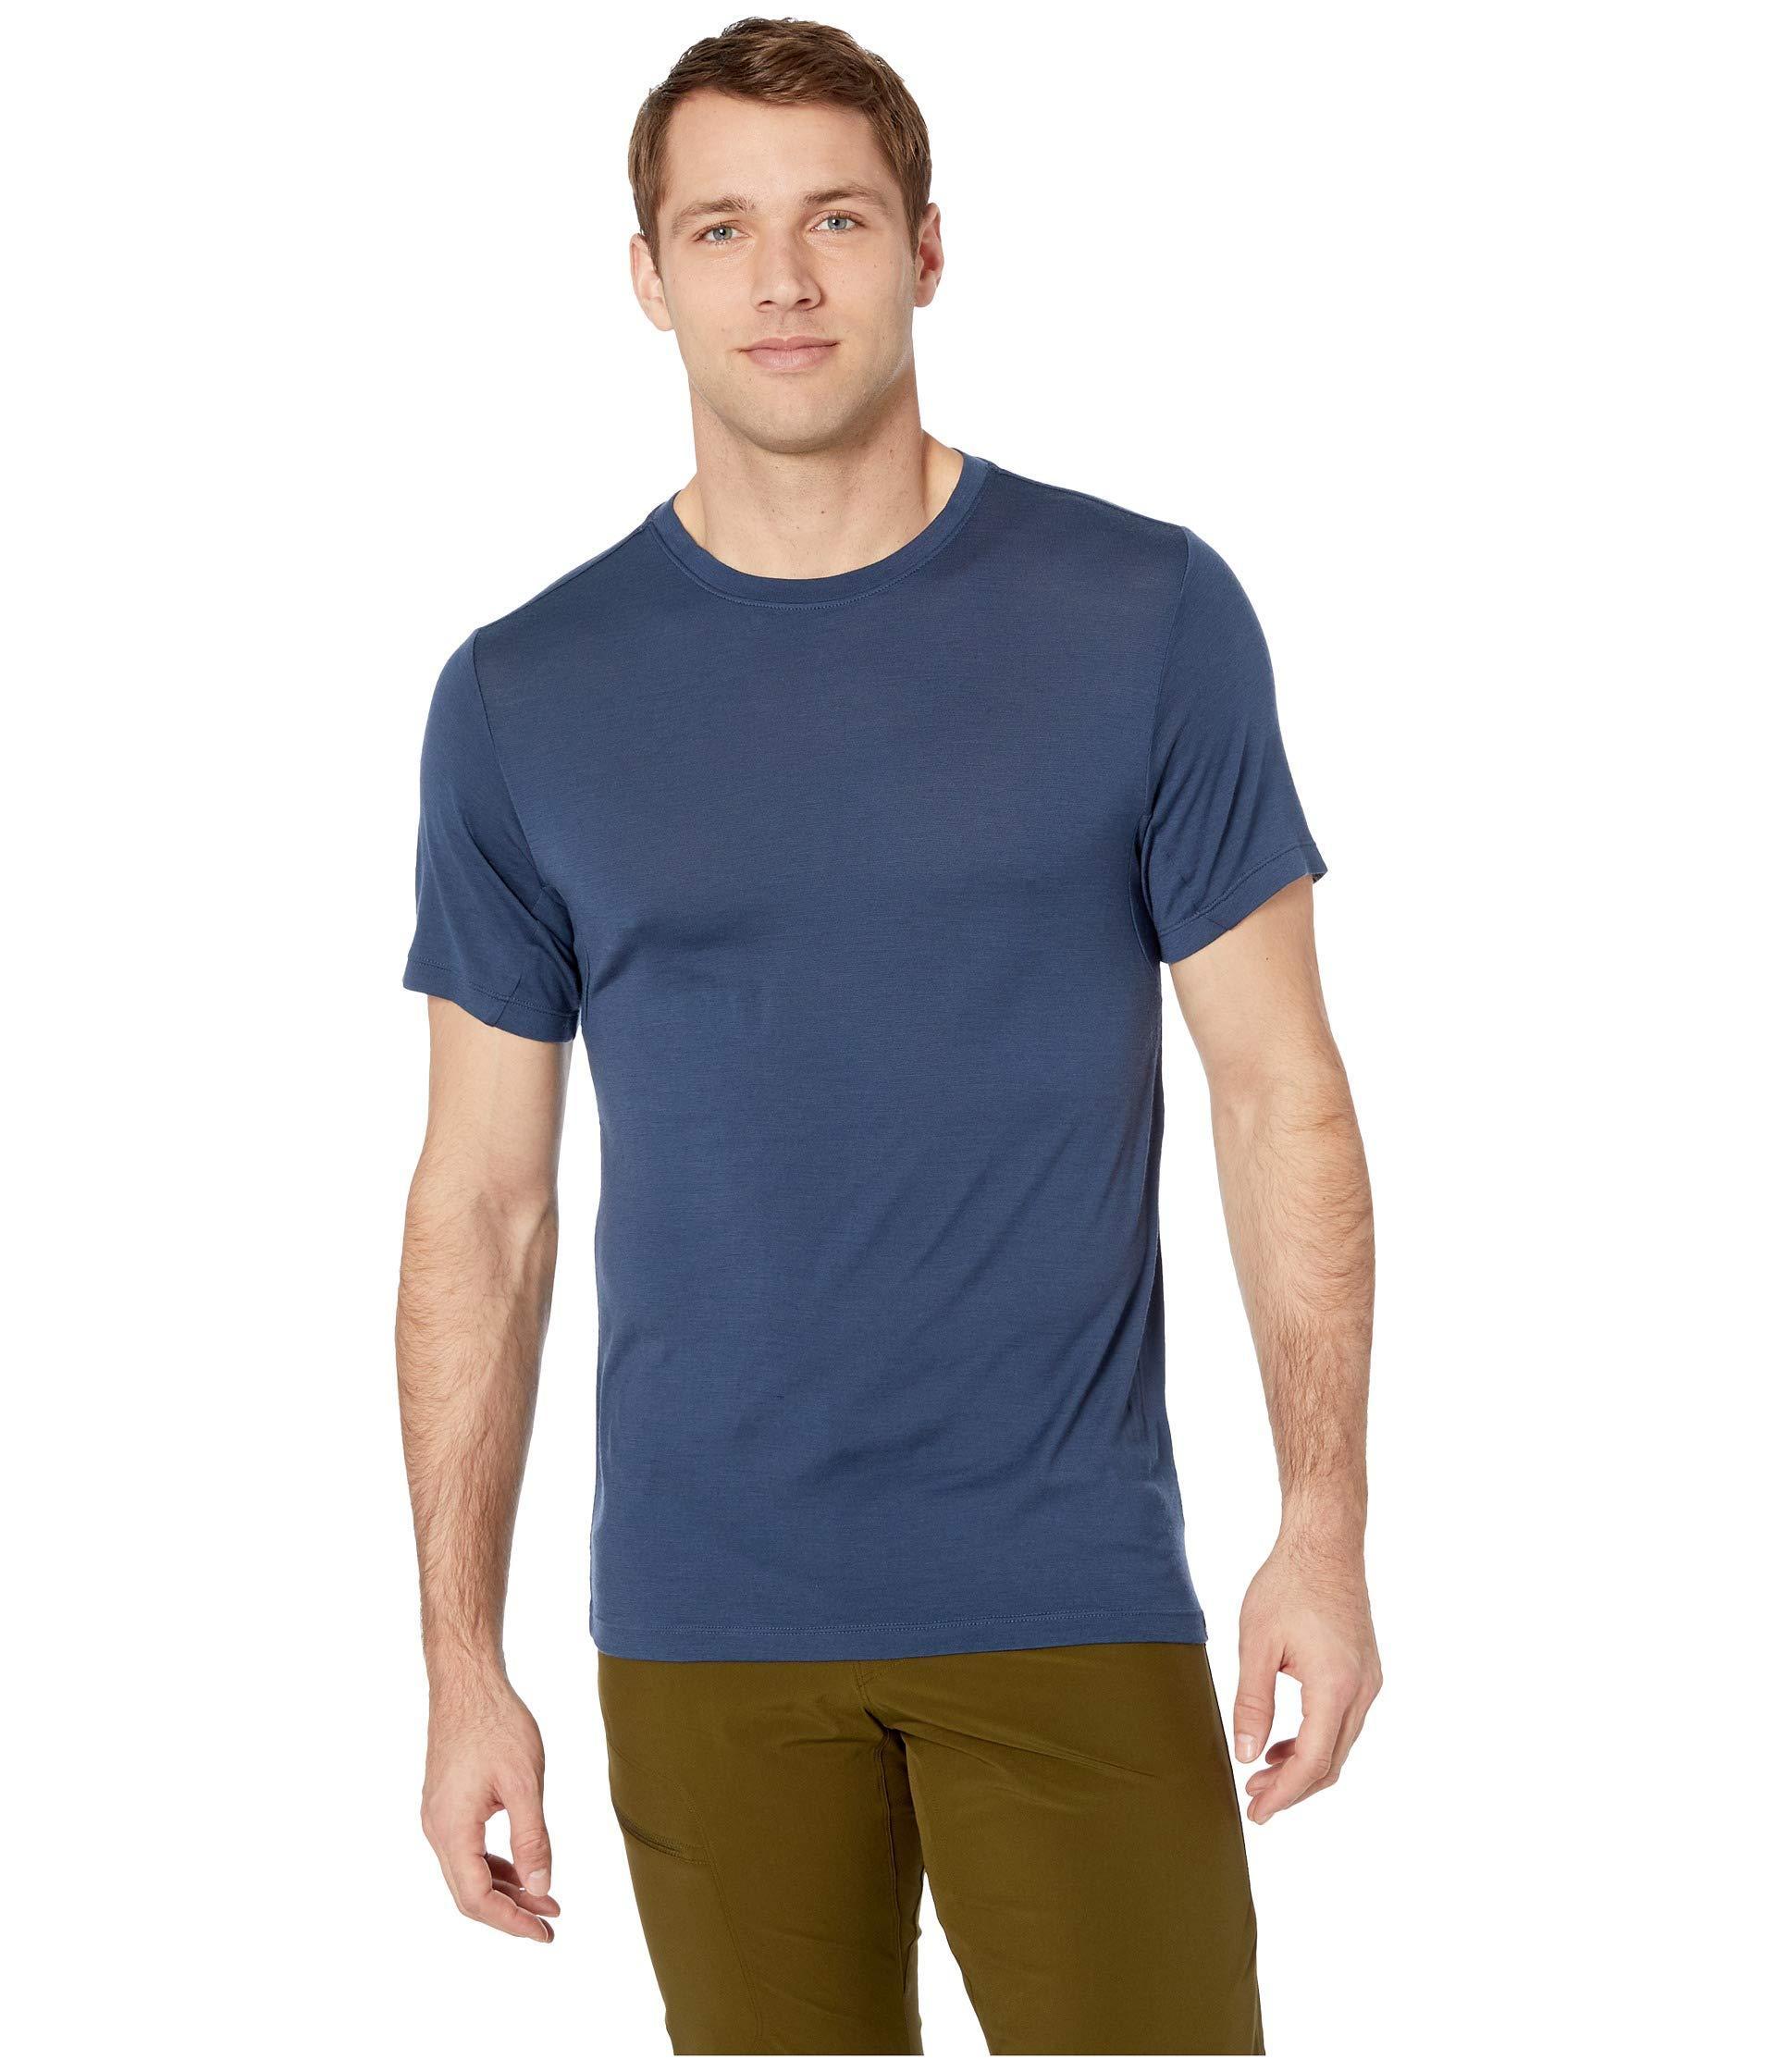 49c8c907 Mountain Hardwear. Blue Diamond Peaktm Short Sleeve Tee (light Army) Men's  Clothing